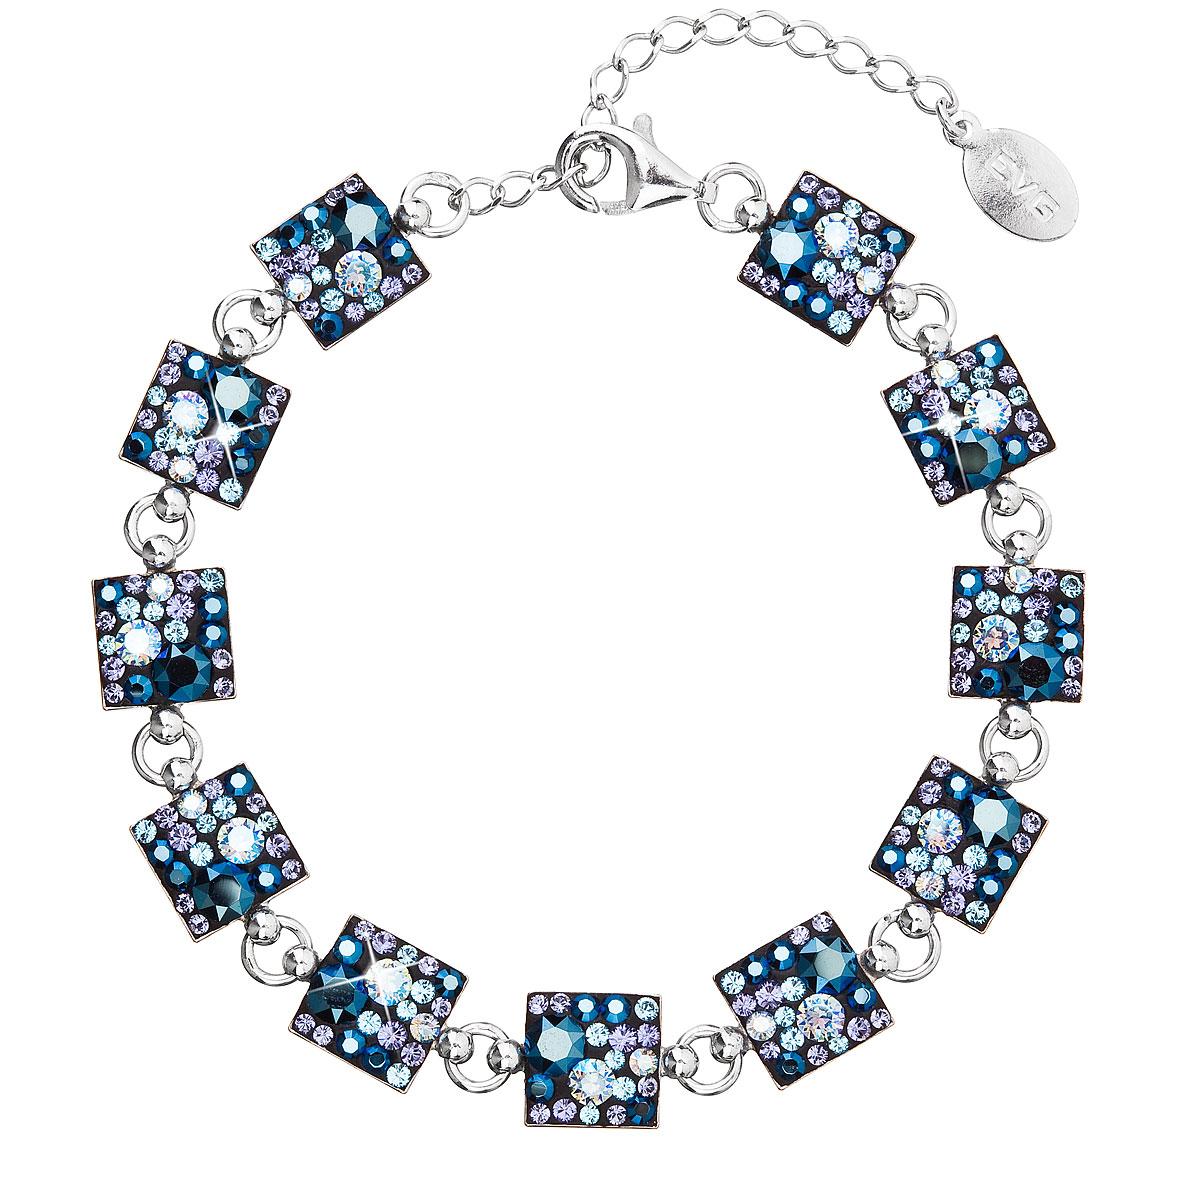 Evolution Group Stříbrný náramek se Swarovski krystaly modrý 33047.3 blue style